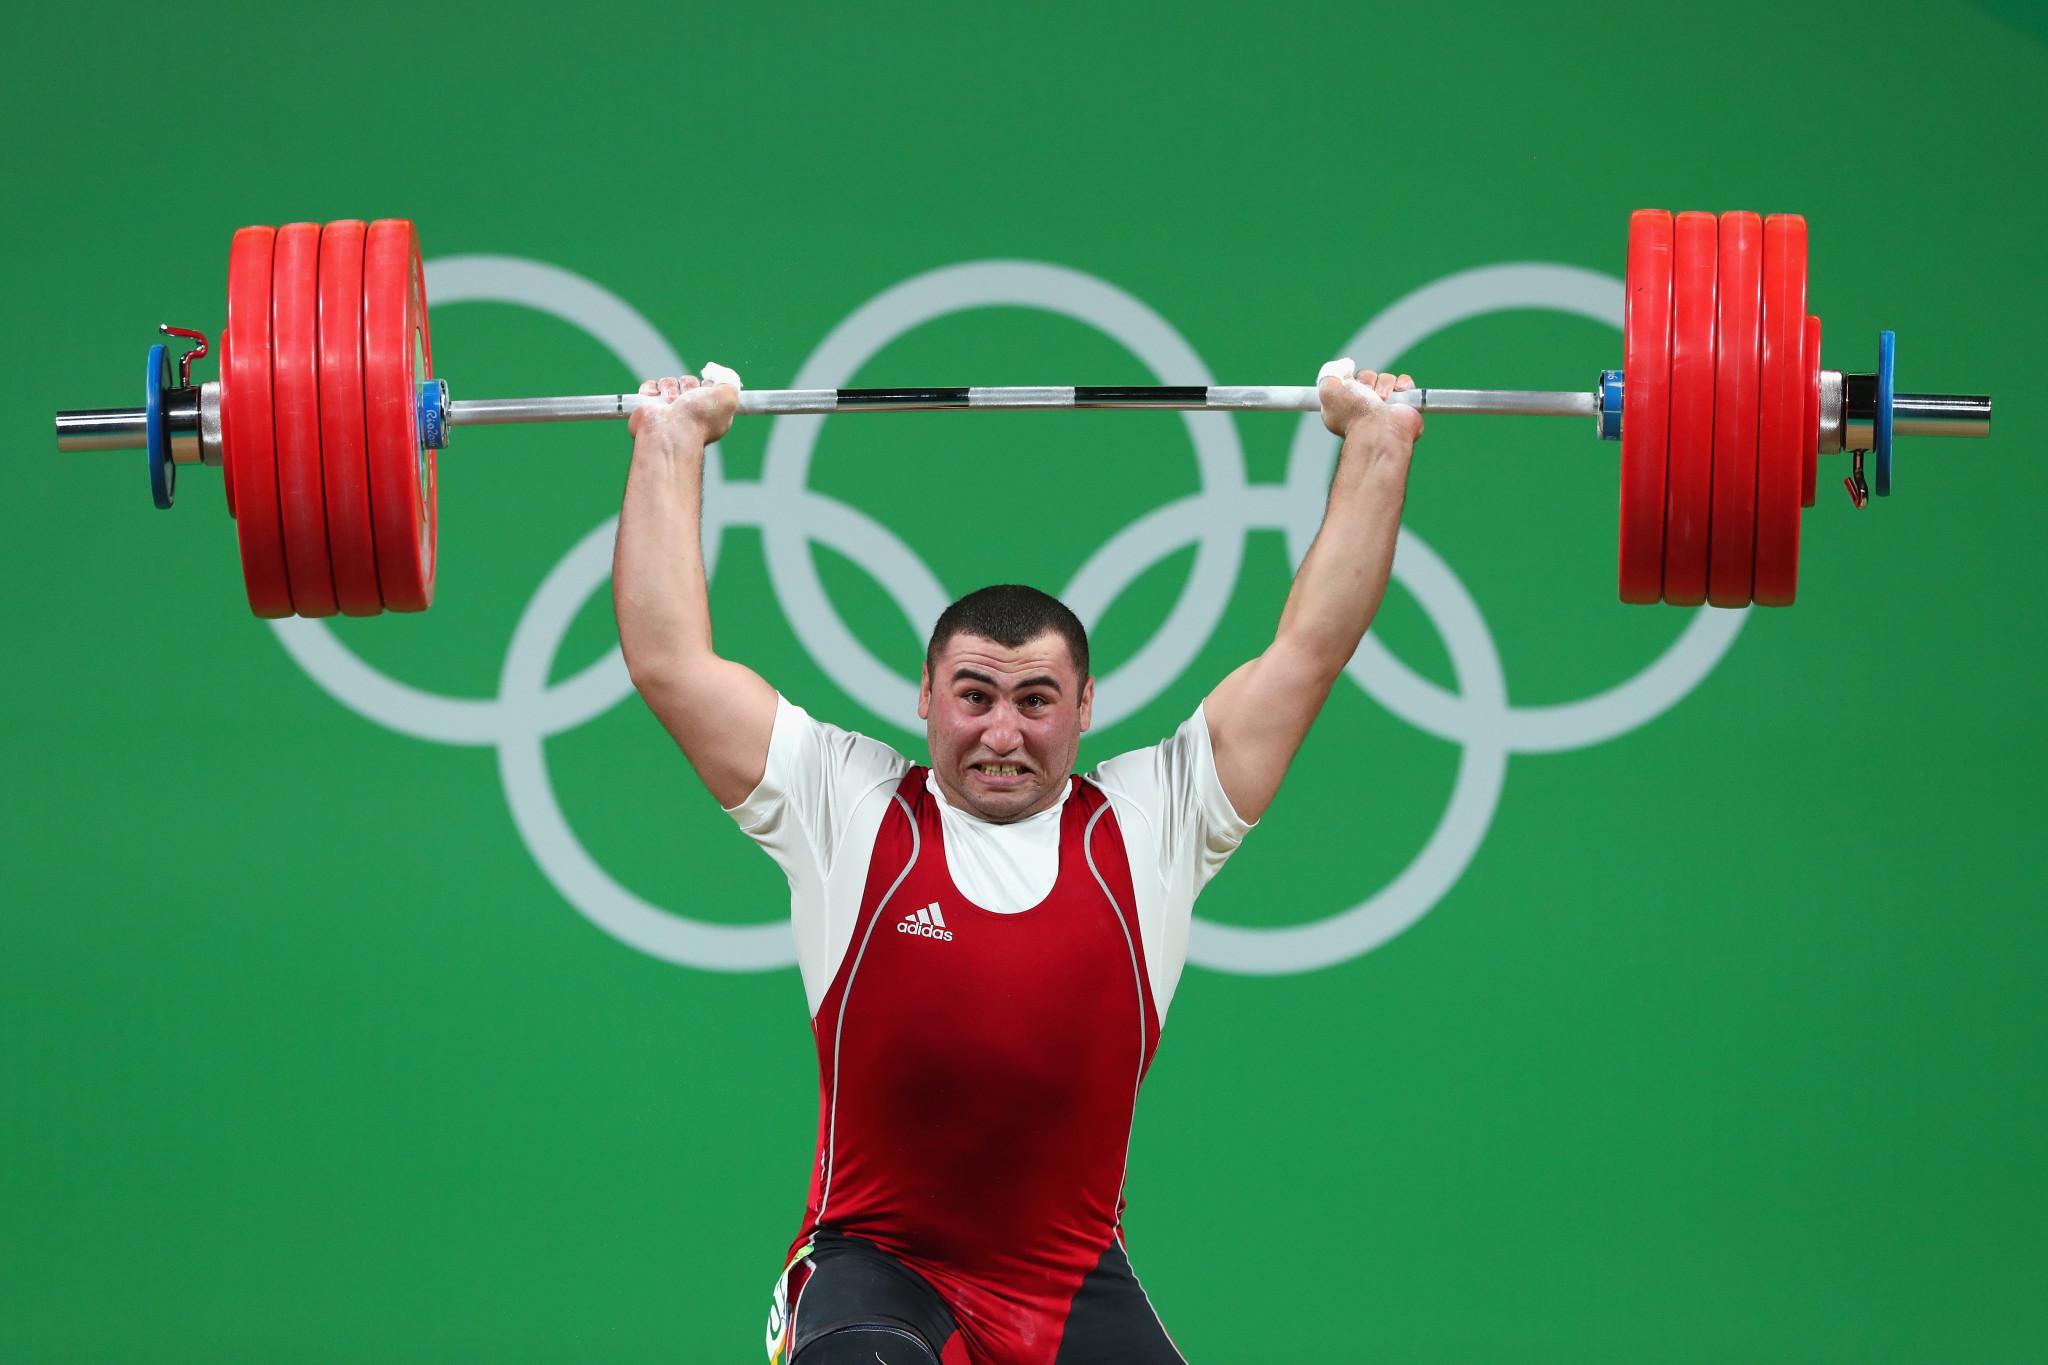 Olympic weightlifting medallist and Tokyo 2020 hopeful Martirosyan investigated over fatal motor crash